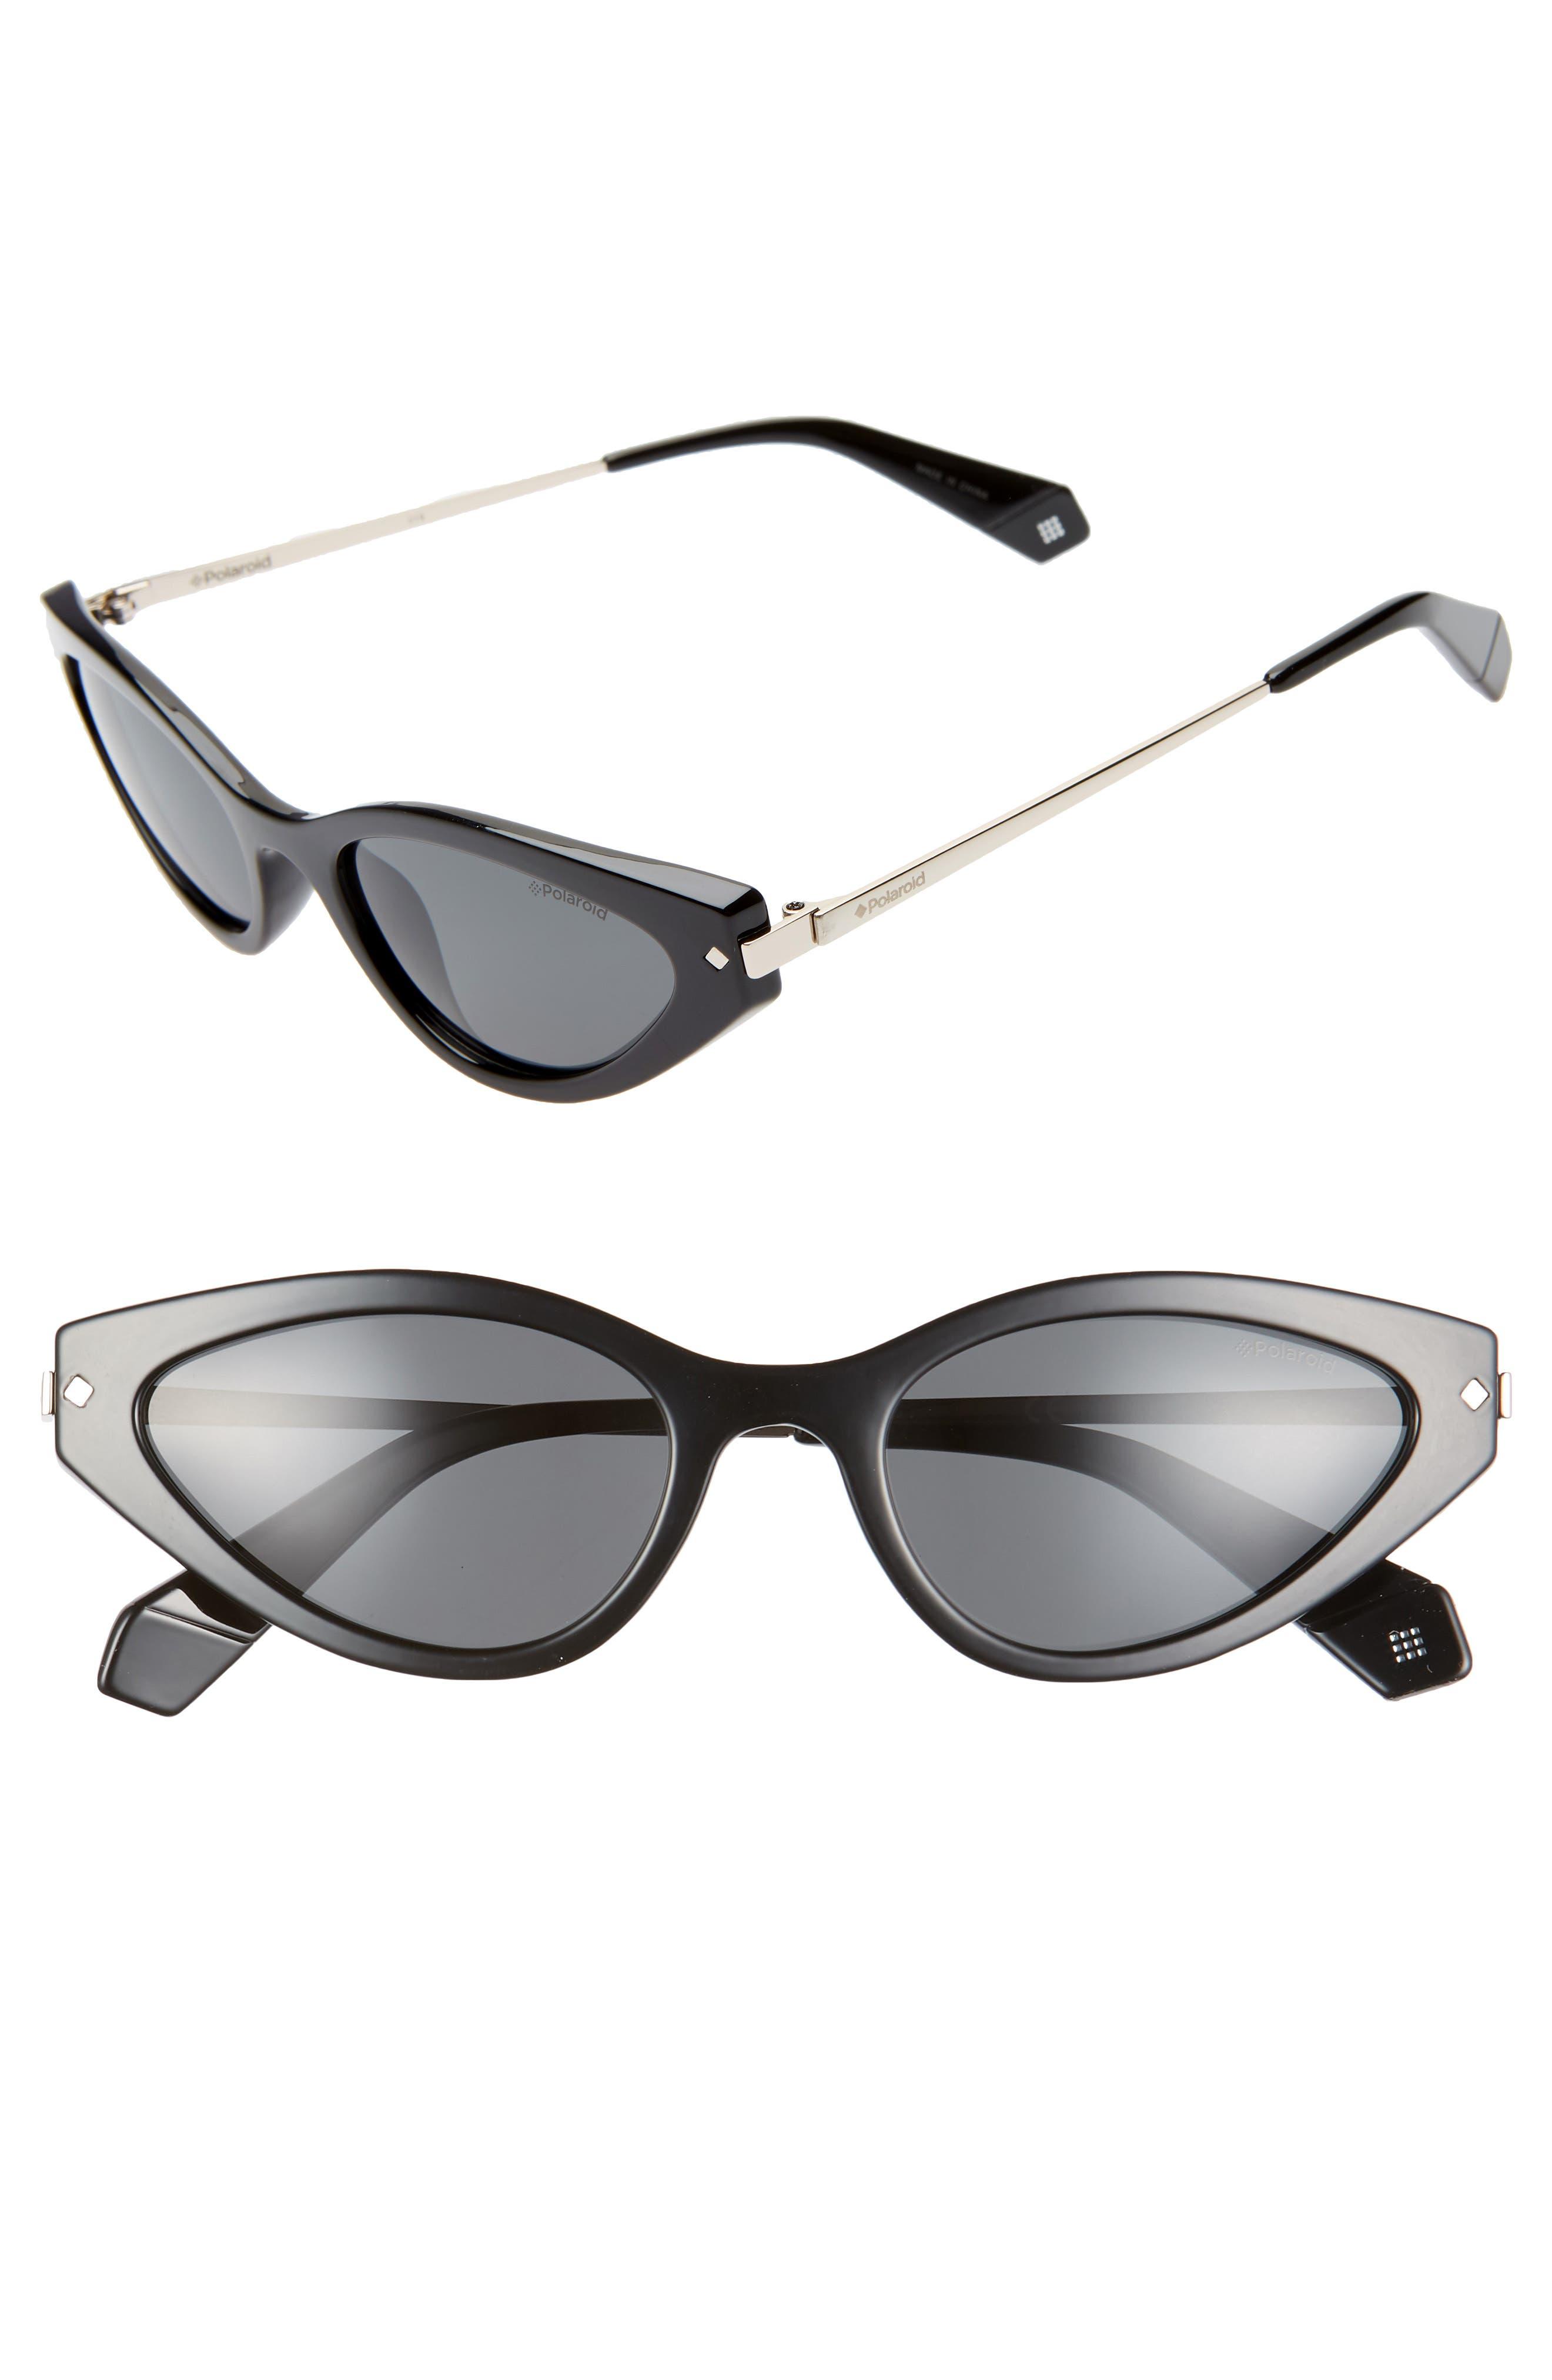 Polaroid 5m Polarized Cat Eye Sunglasses - Black